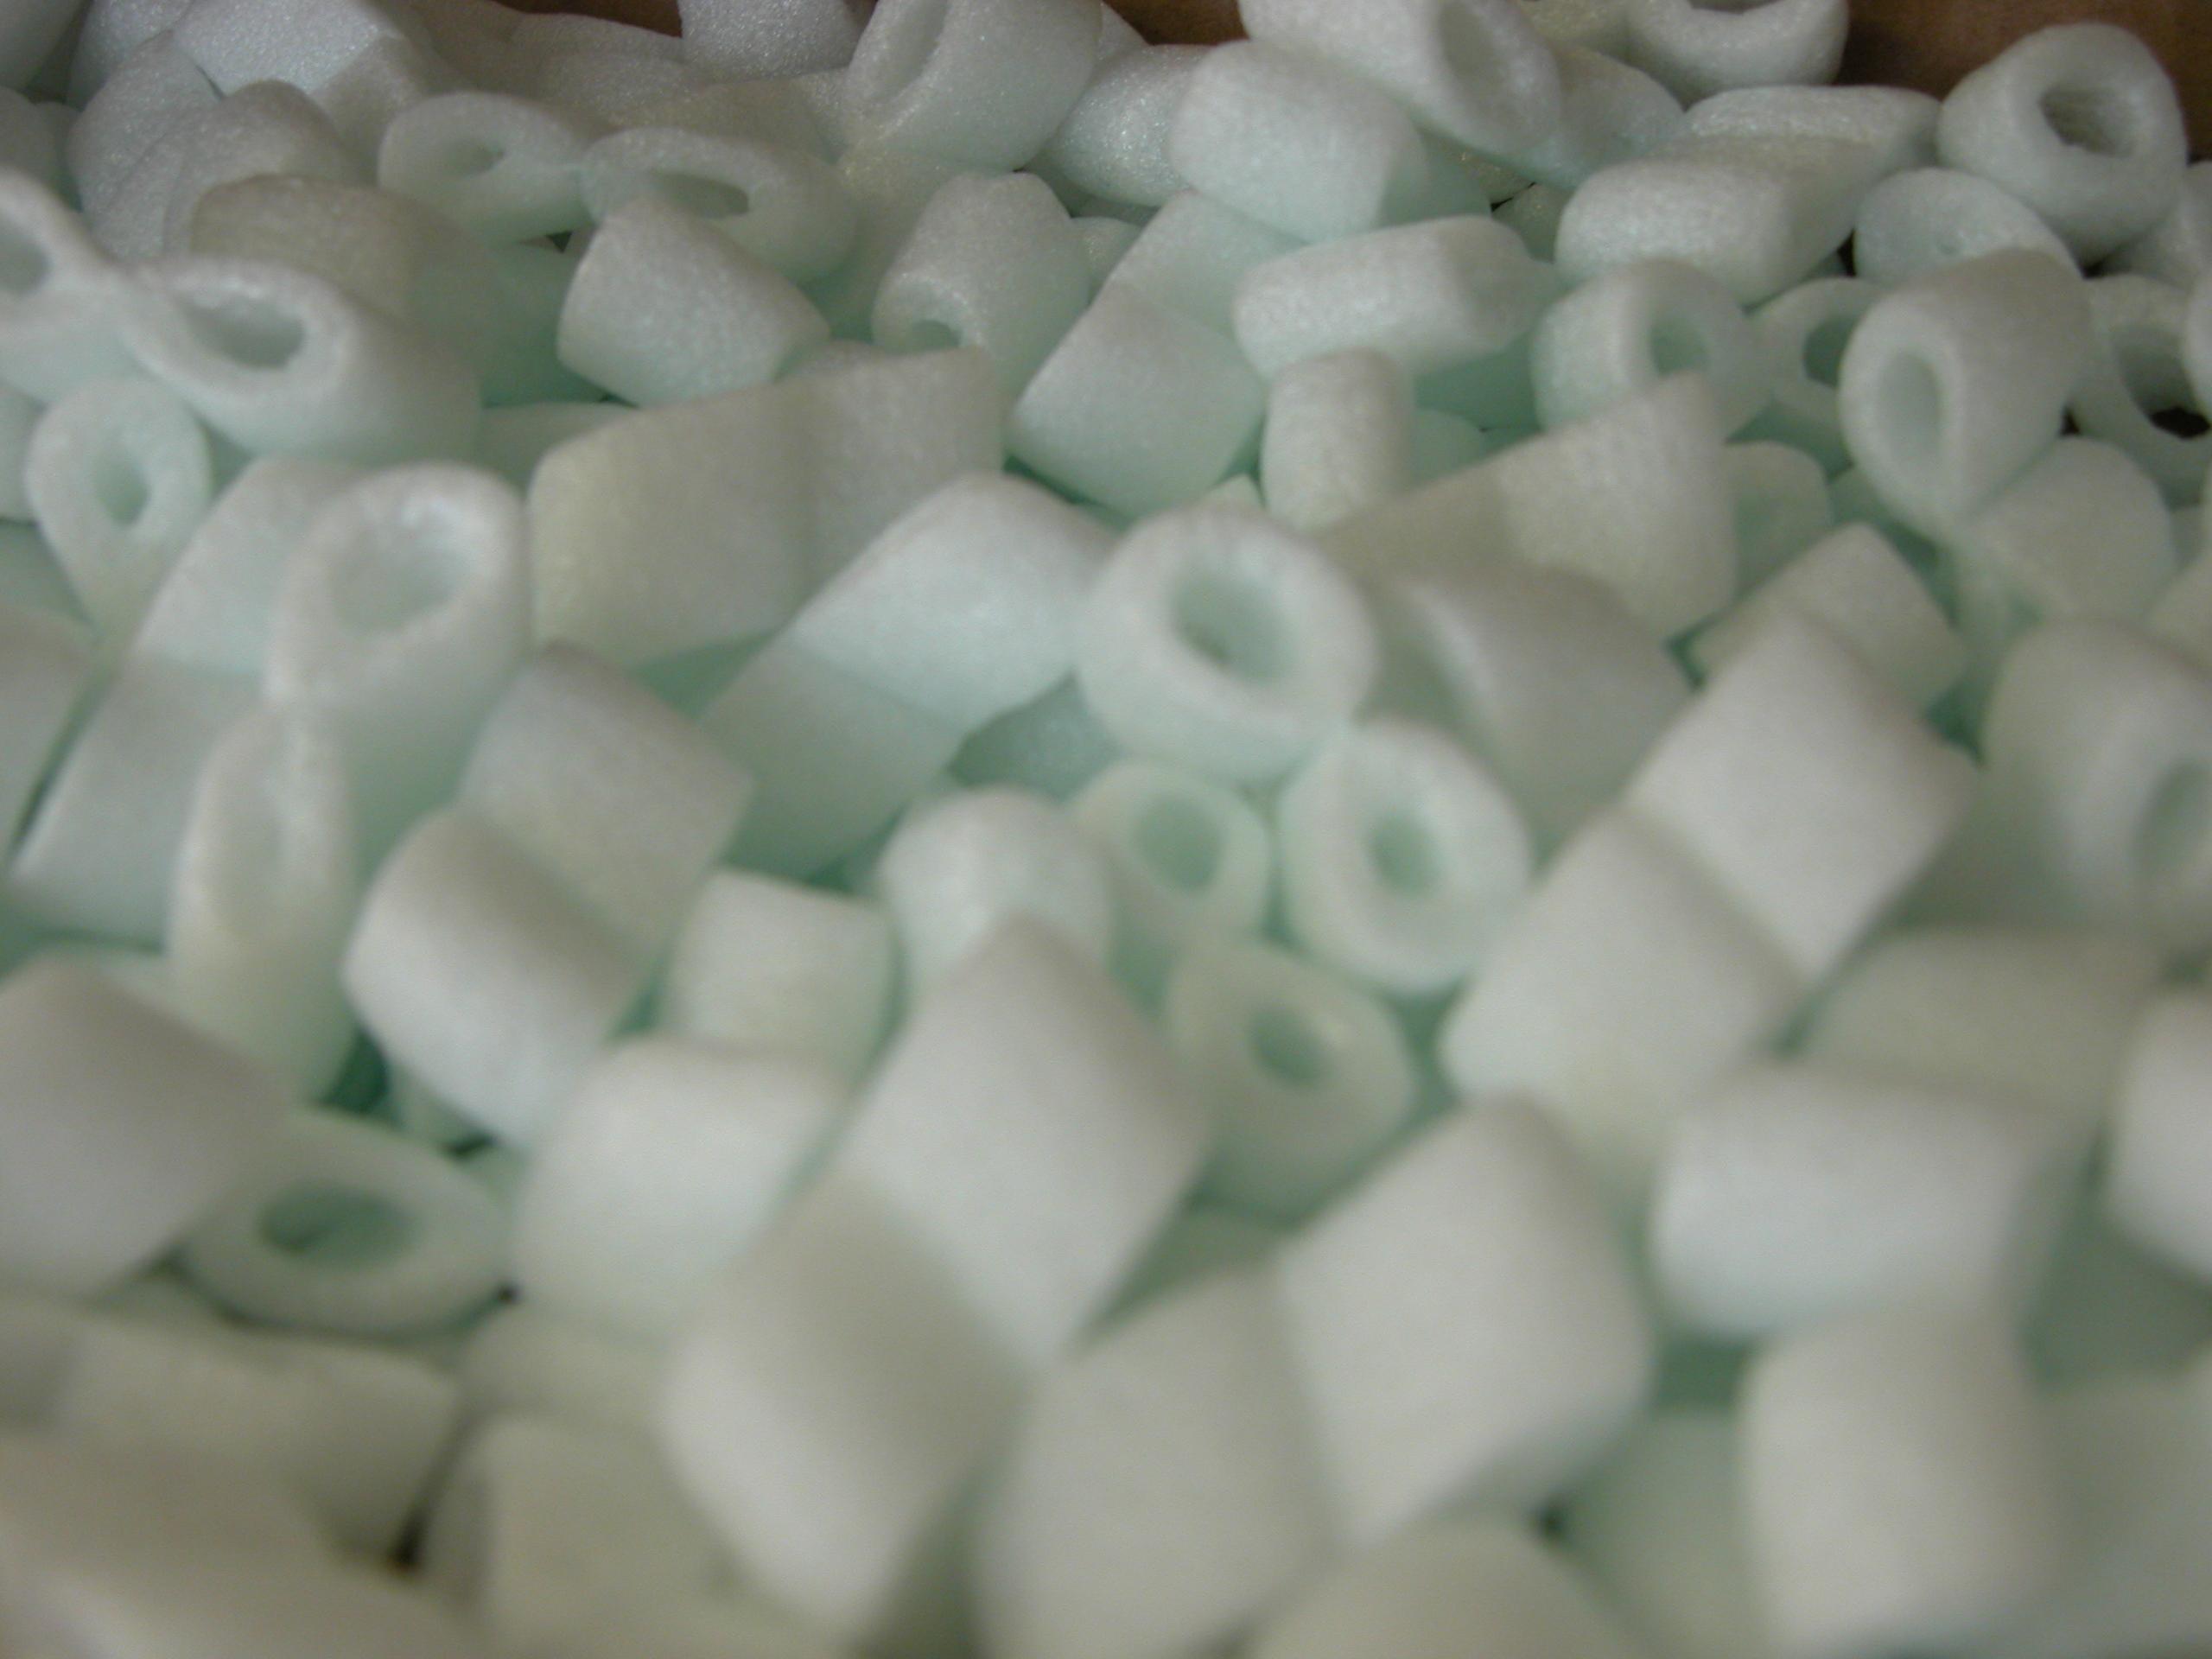 foam plastics eights soft white cushioning plastic royalty free